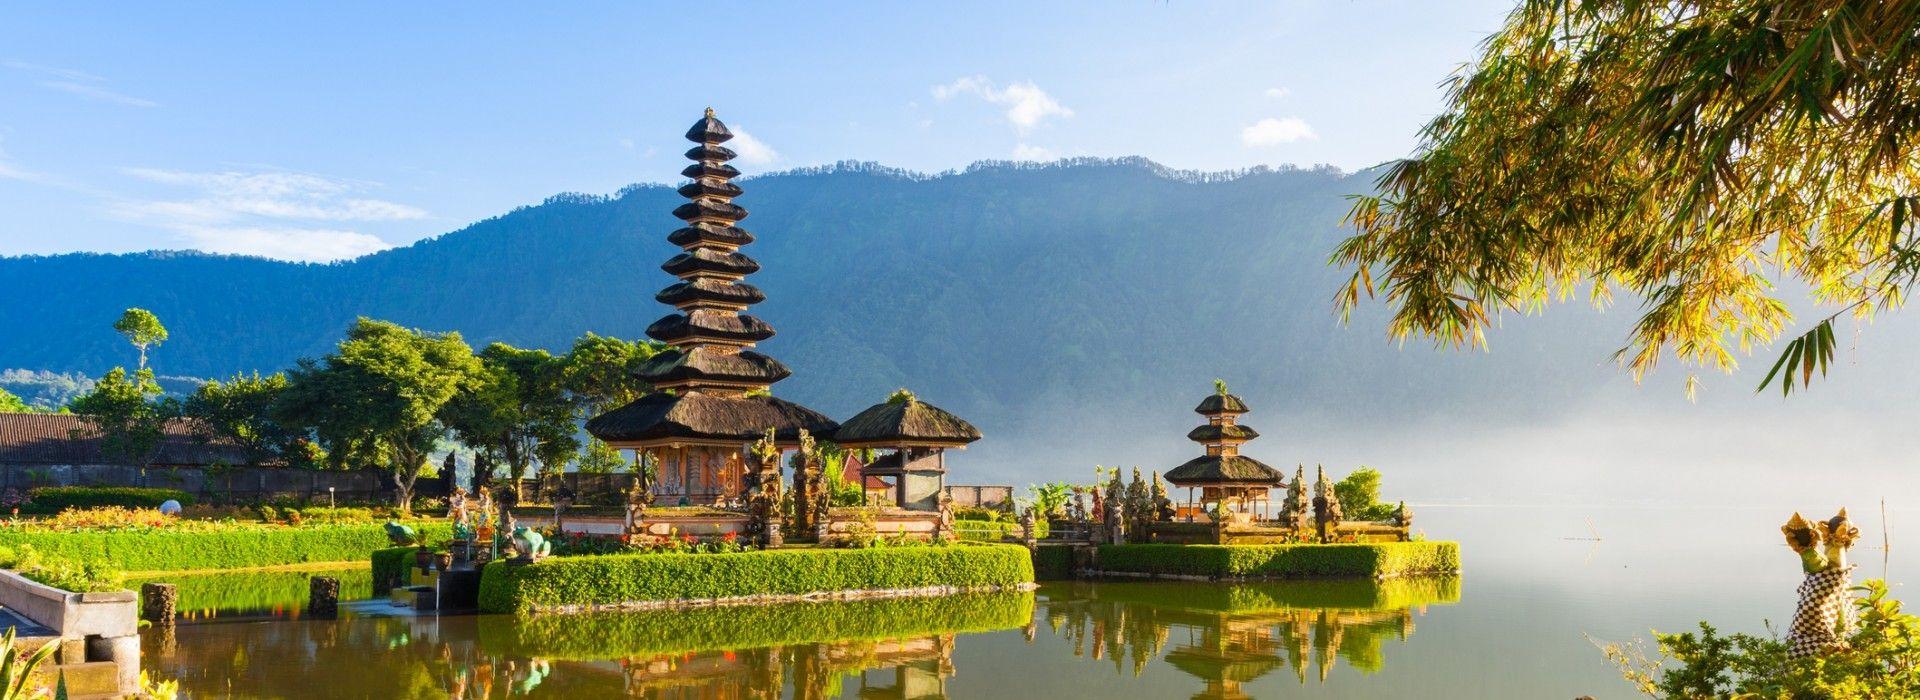 Spiritual or religious tours in Indonesia